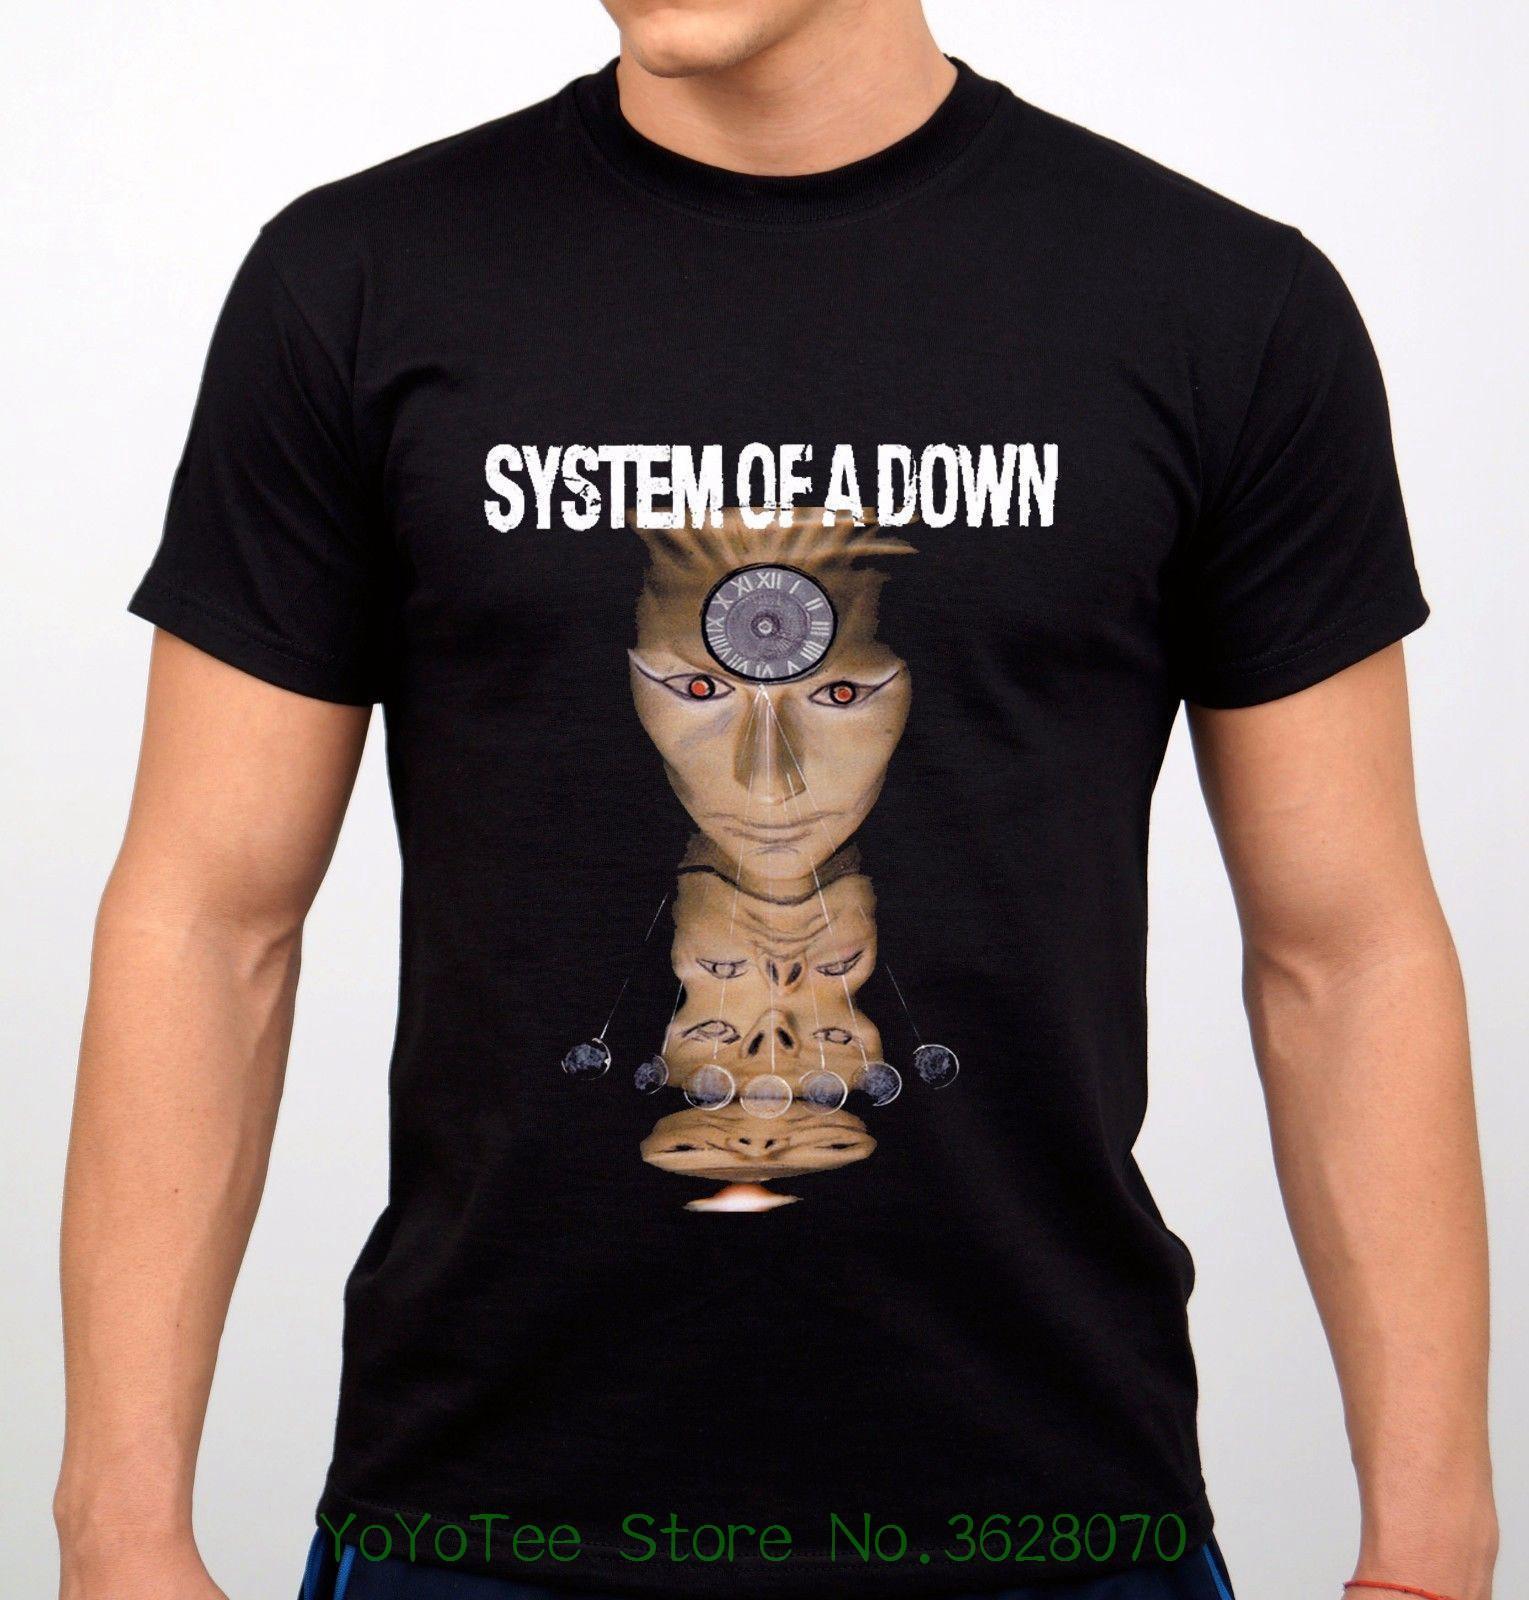 5fe3e515a Summer Casual Man T Shirt Good Quality Sistem Of A Down Tshirtrock Band T  Shirt Black New Weird T Shirts T Shirt Shop Online From Jie027